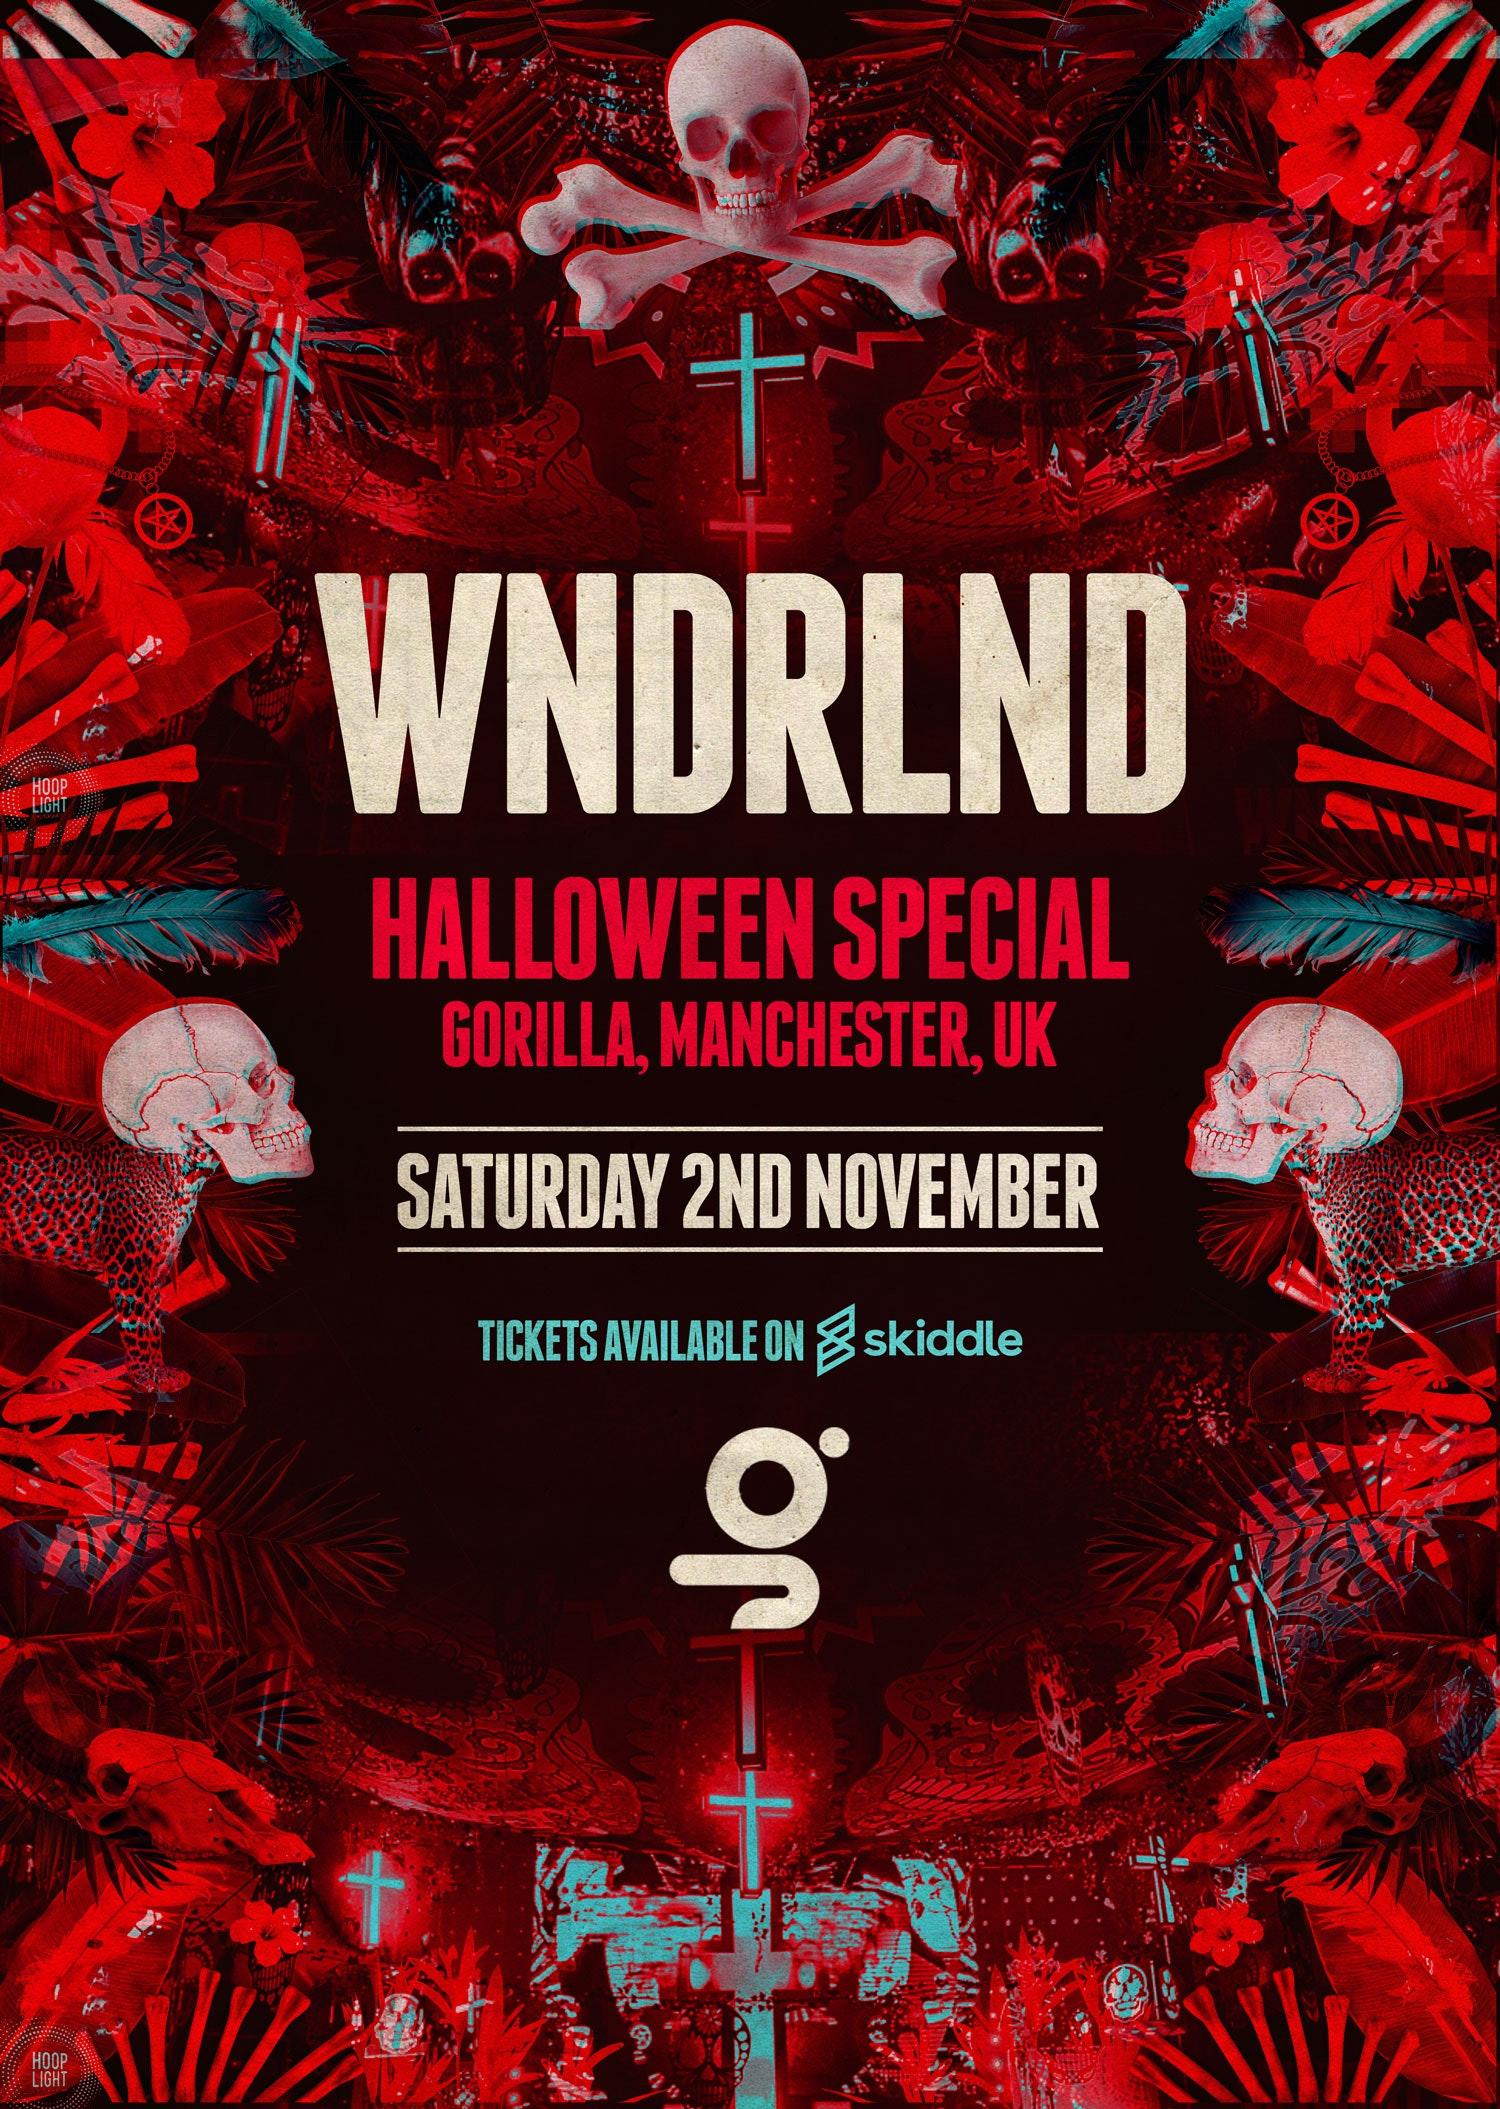 WNDRLND – Halloween Special